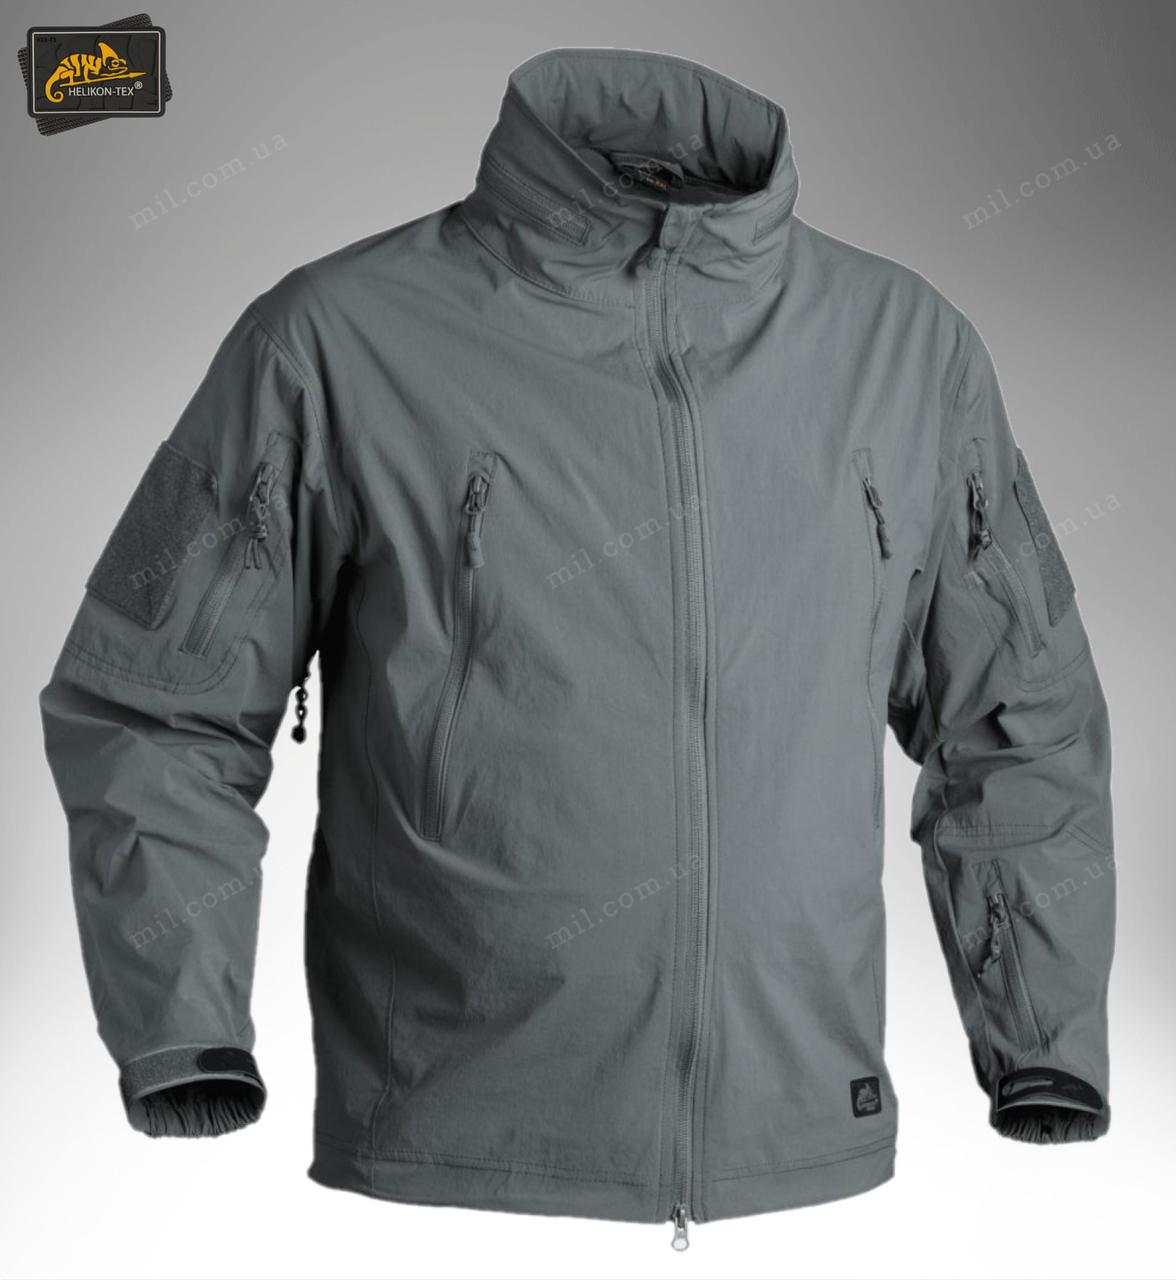 Демисезонная тактическая куртка Helikon-Tex® TROOPER Soft Shell (a green)